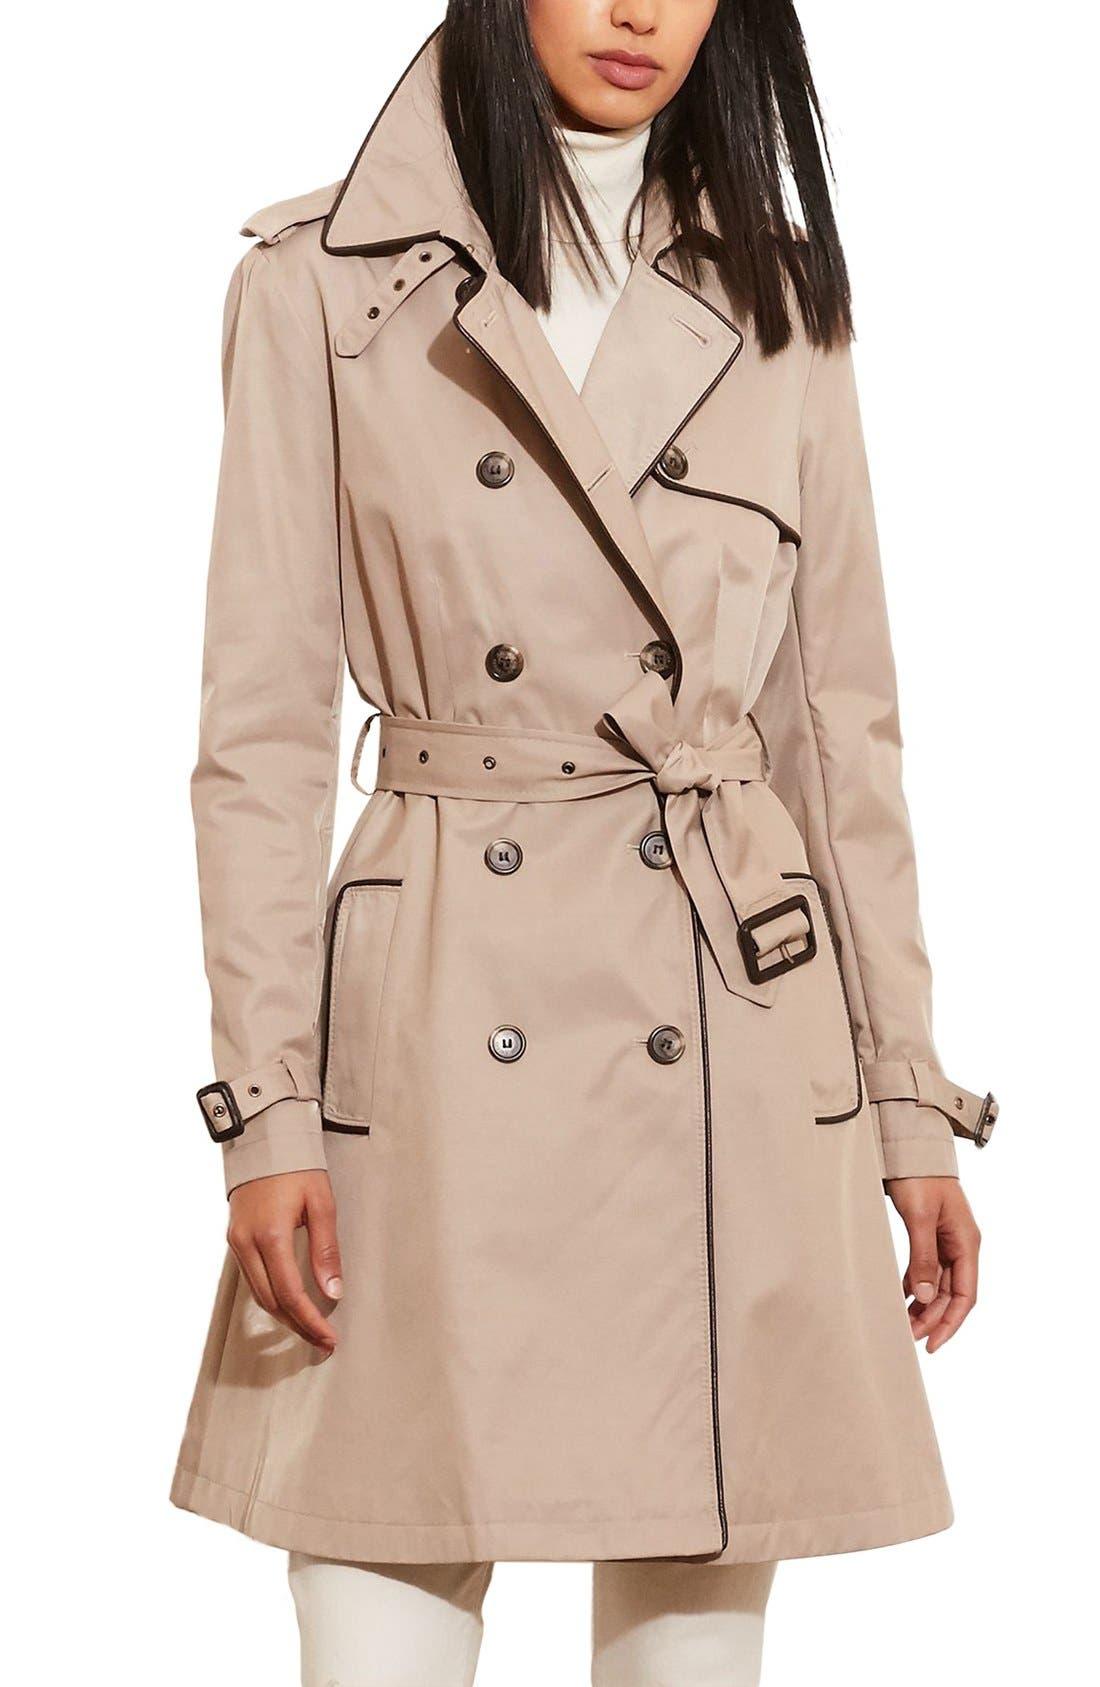 Main Image - Lauren Ralph Lauren Faux Leather Trim Trench Coat (Regular & Petite)